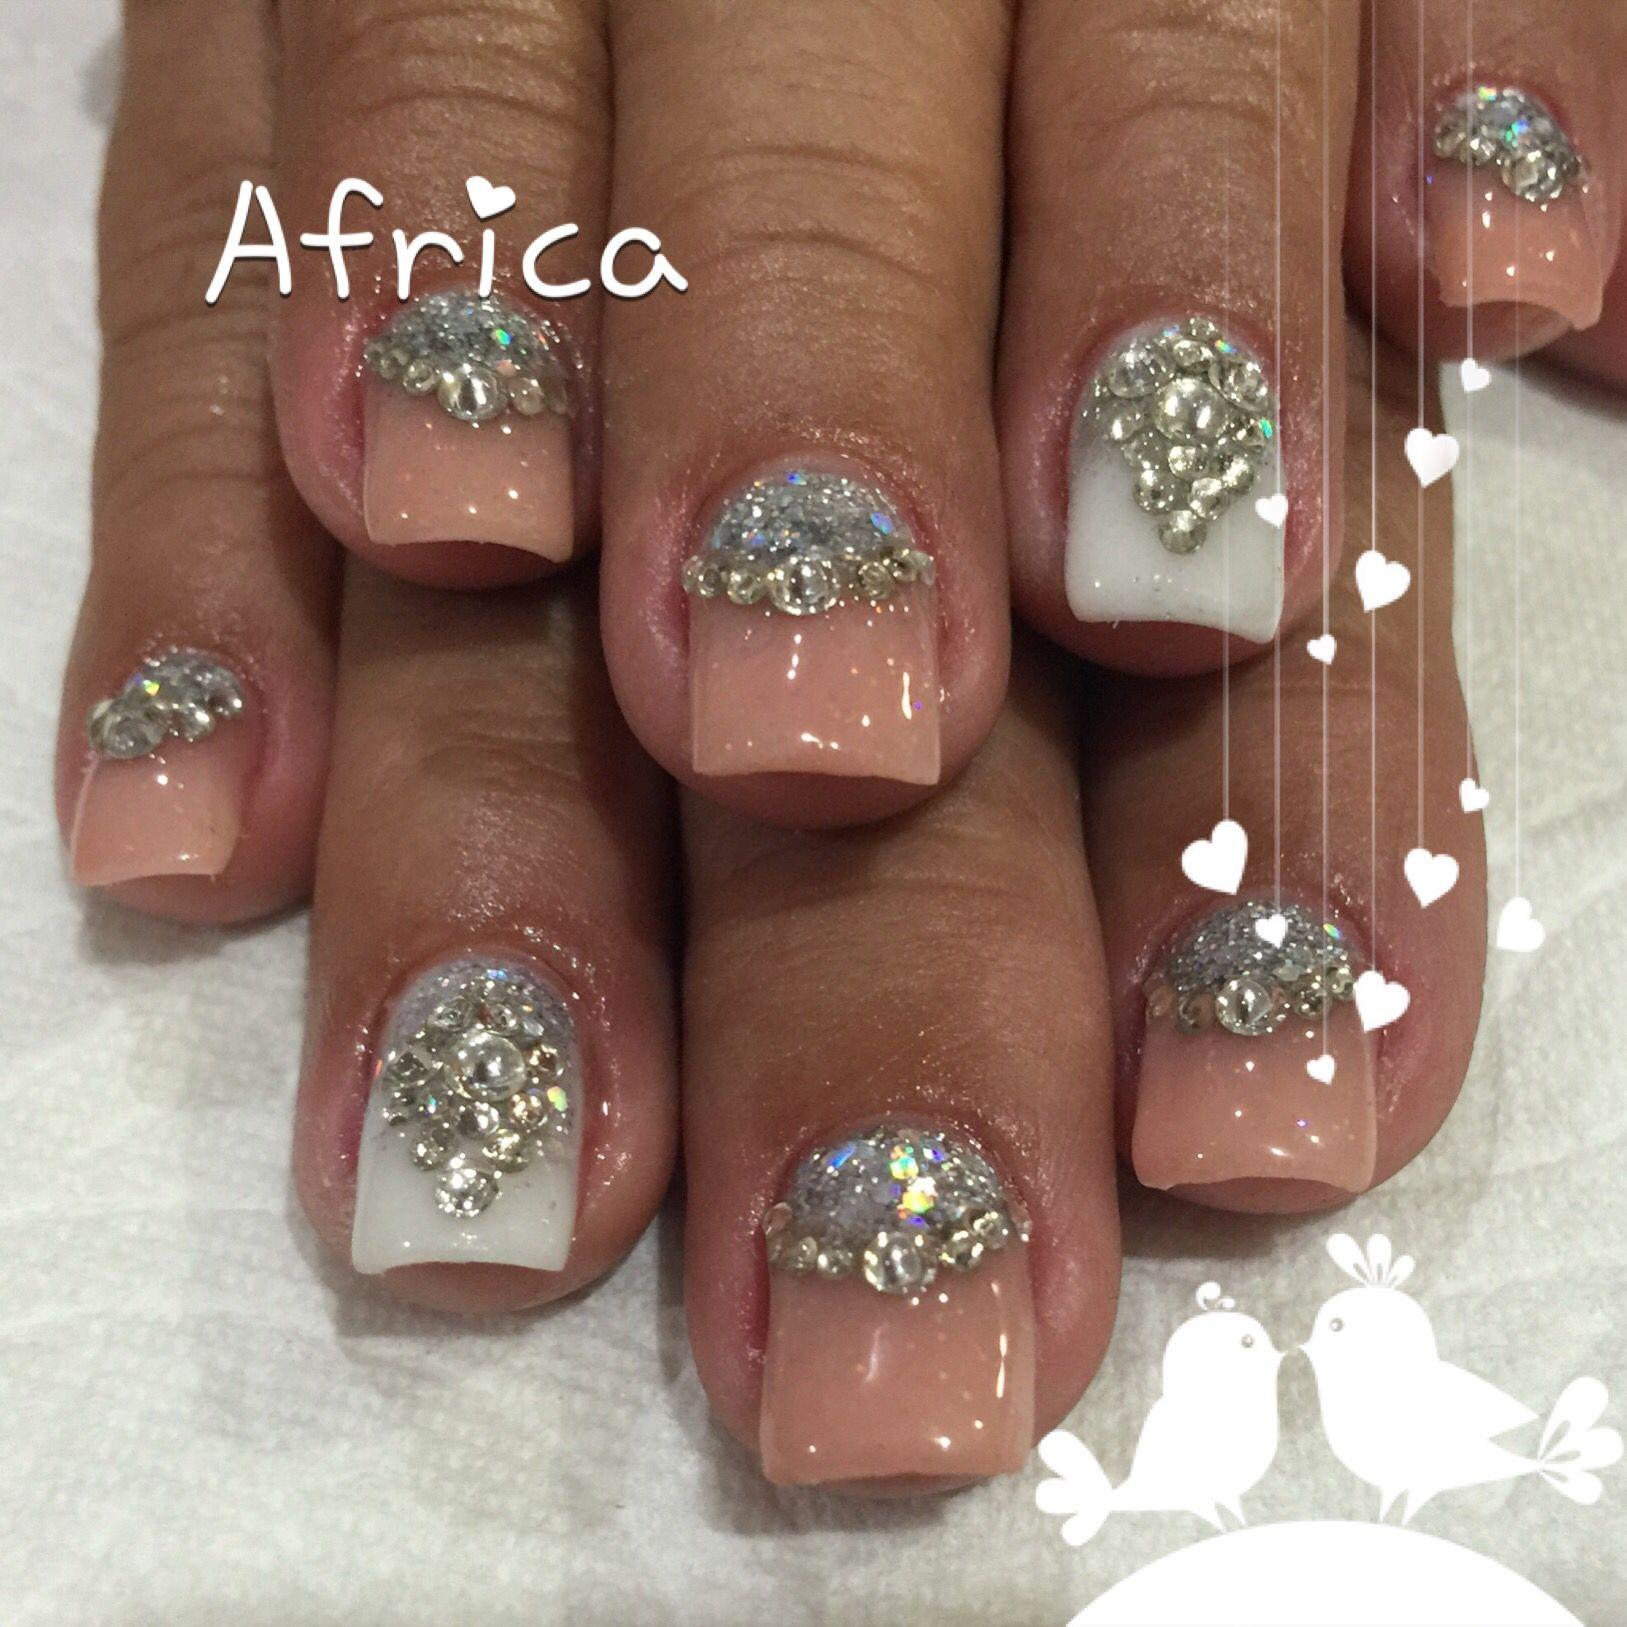 Uñas acrílicas con piedras | Uñas Africa | Pinterest | Uñas acrílico ...